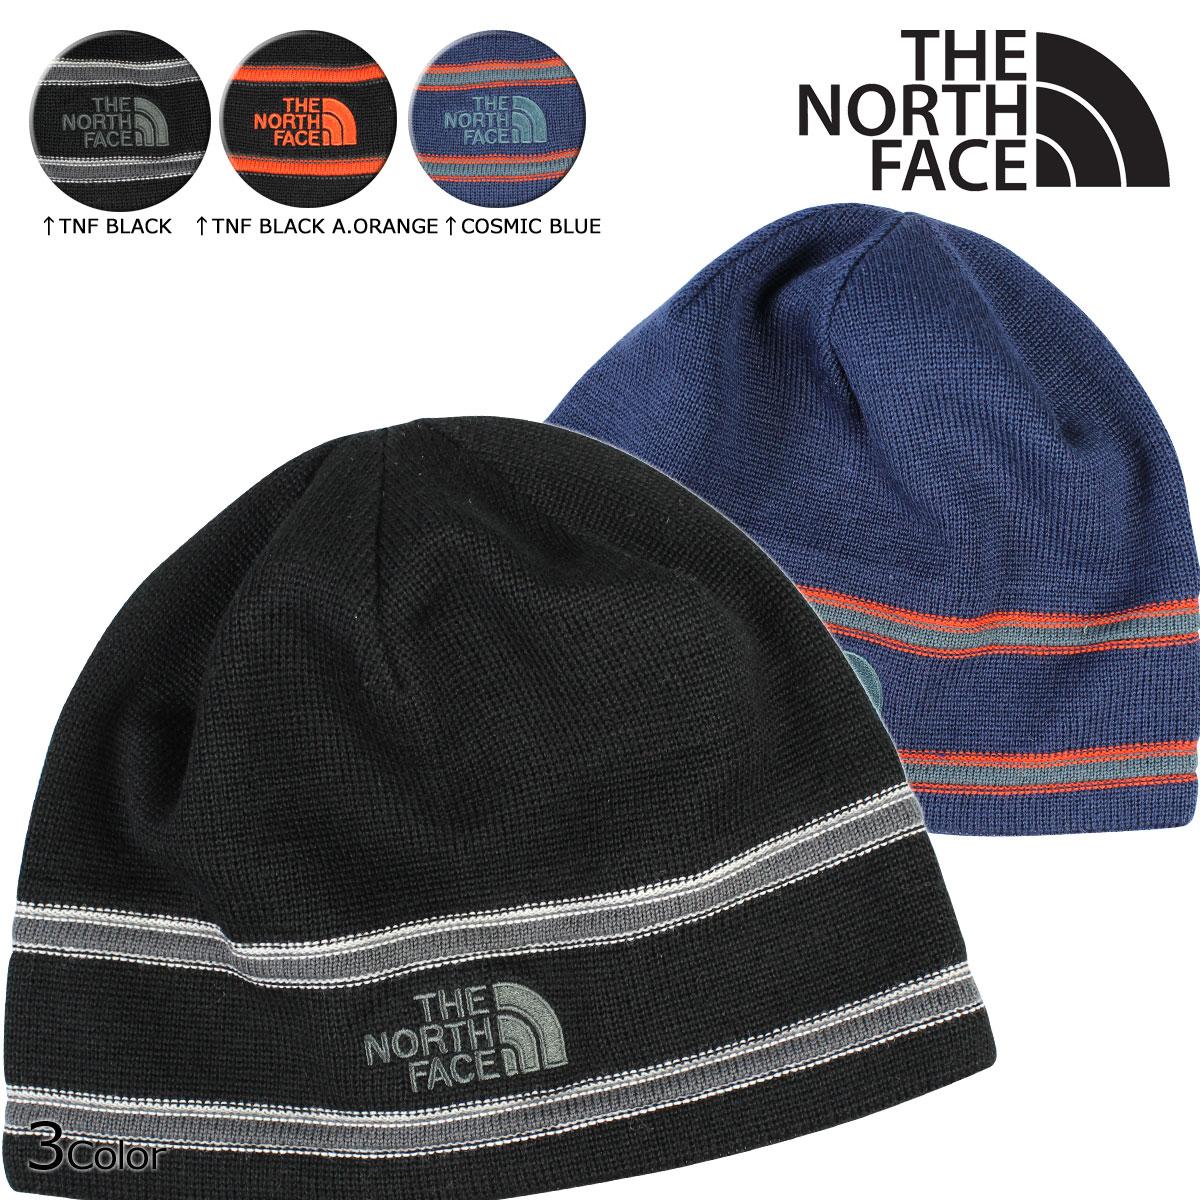 17b599714 THE NORTH FACE north face knit hat Beanie knit Cap LOGO BEANIE men's women's